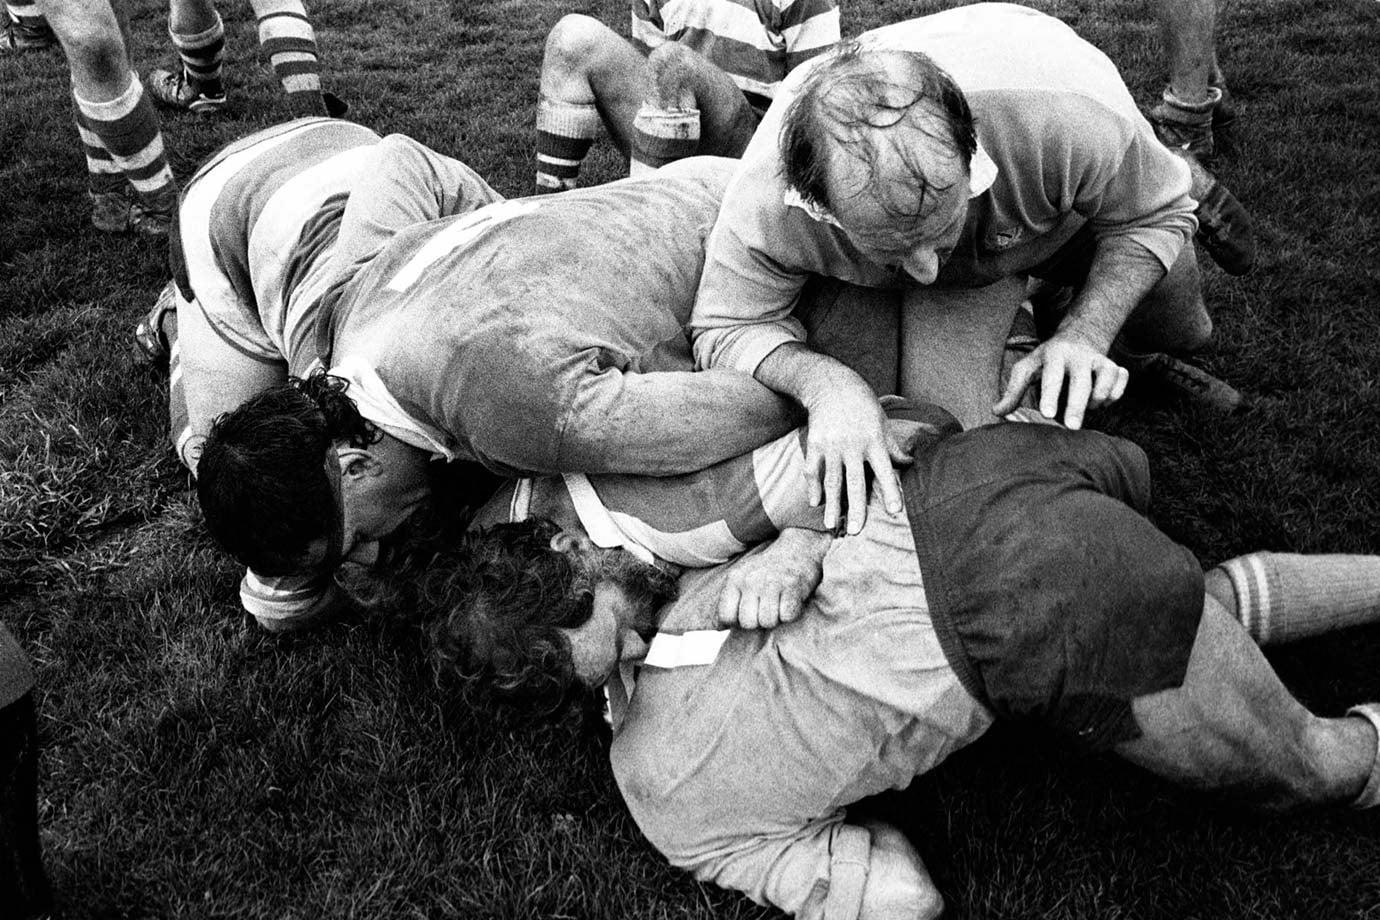 Rugby, Christchurch, 1993, Bruce Foster NZ